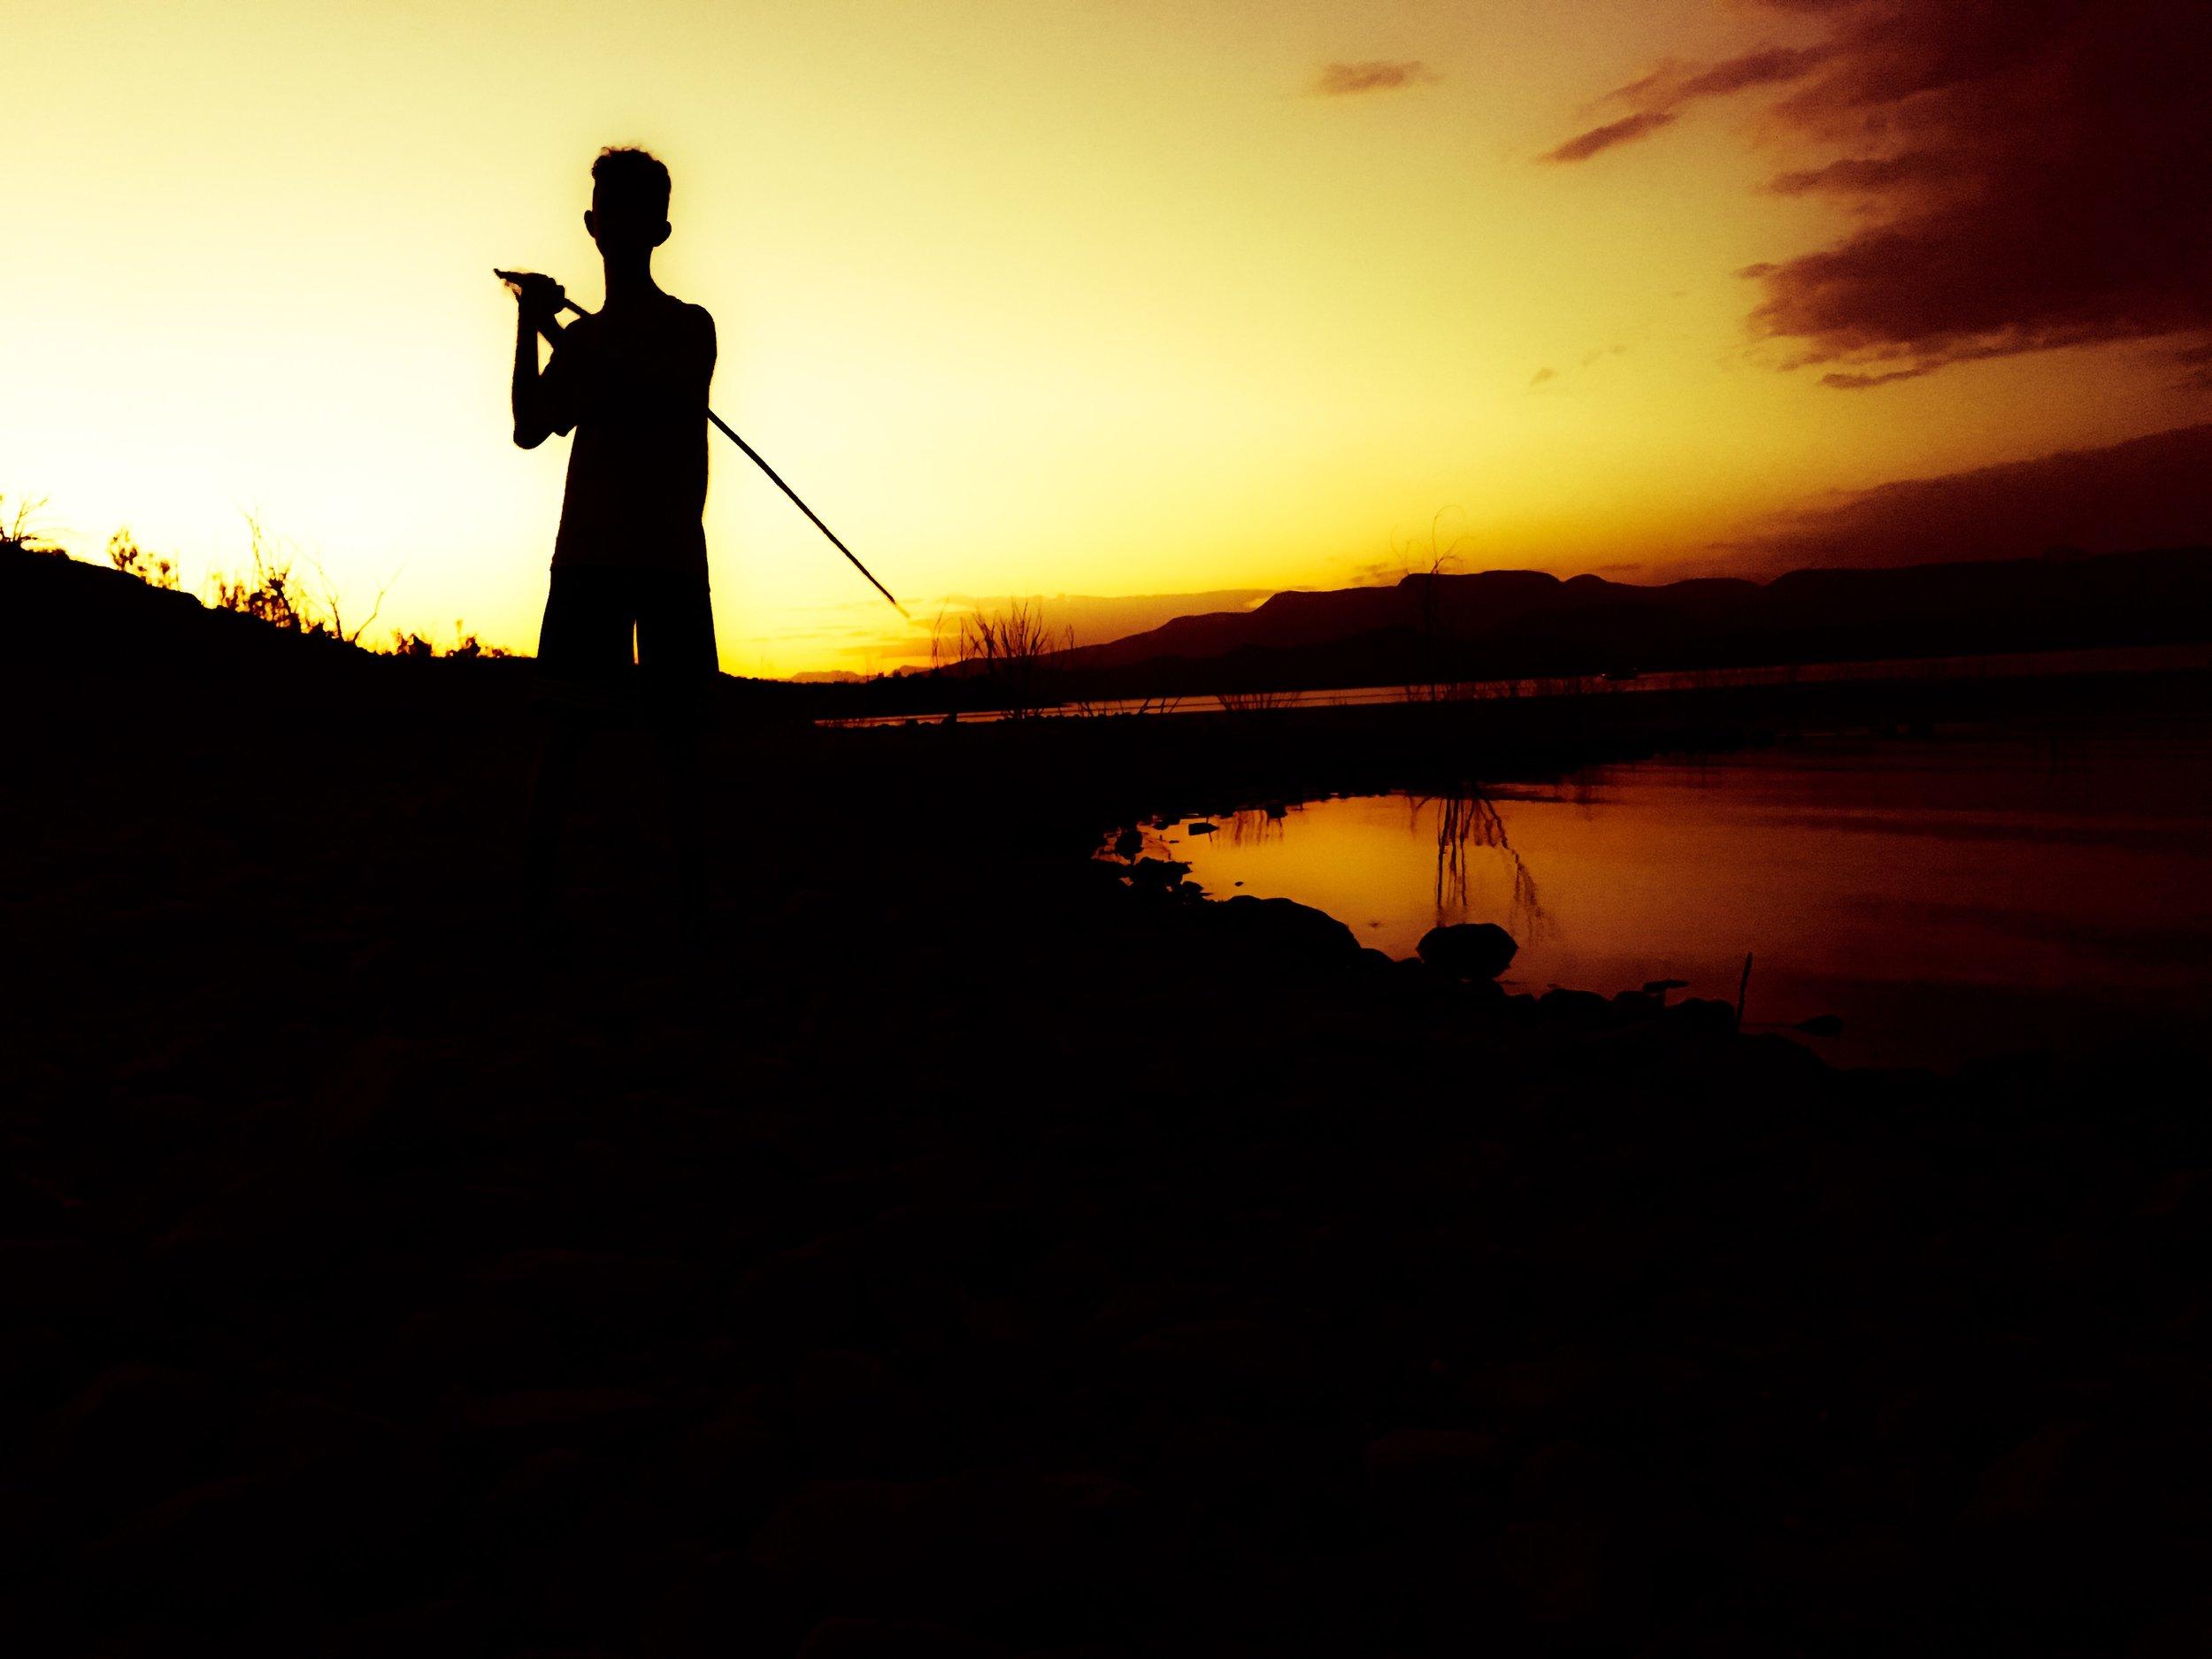 Lucas' Silhouette at lake Rroosevelt